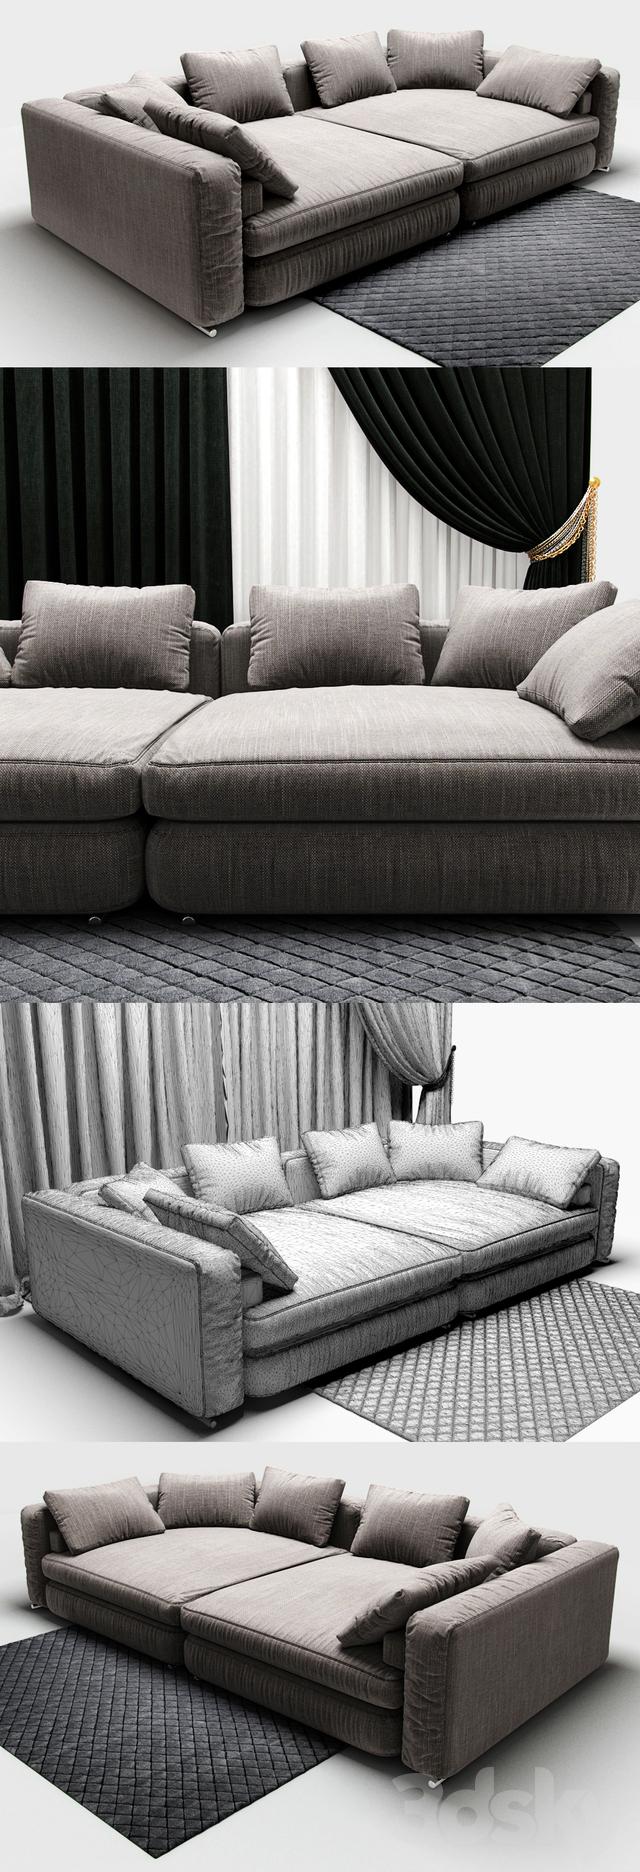 3d models sofa sofa minotti jagger. Black Bedroom Furniture Sets. Home Design Ideas